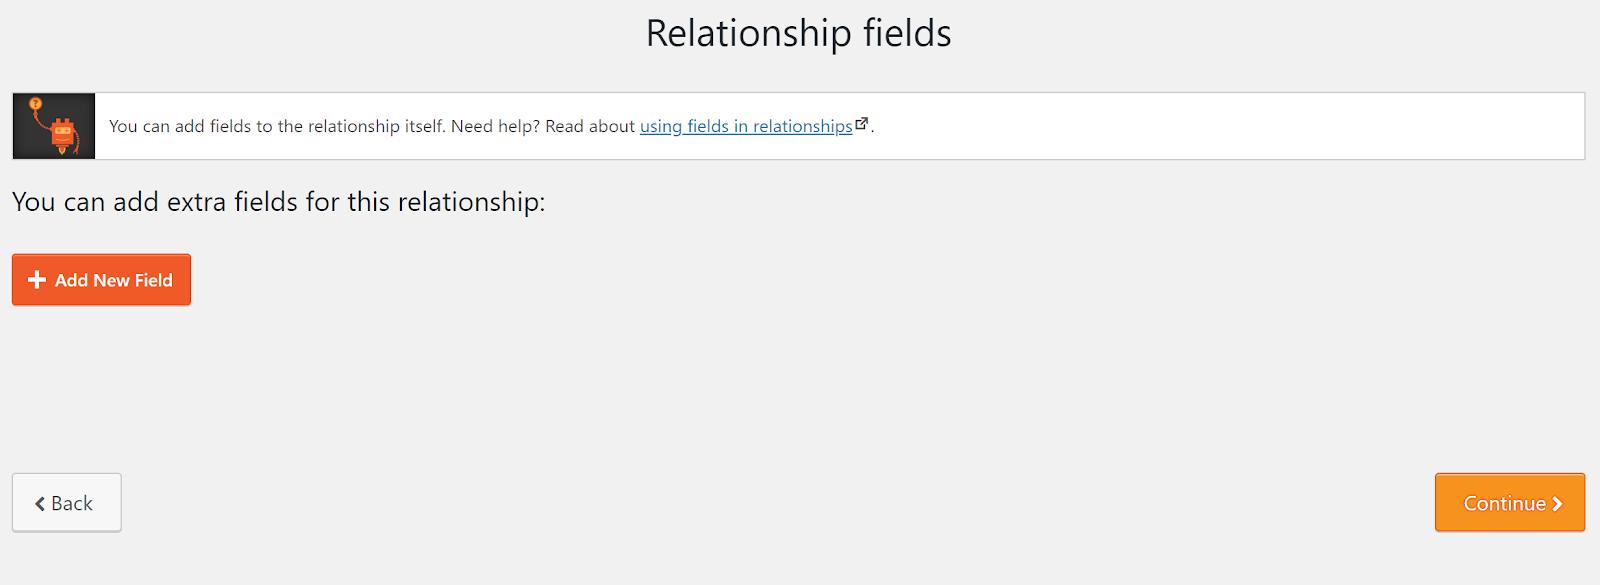 Step 4: Relationship Fields